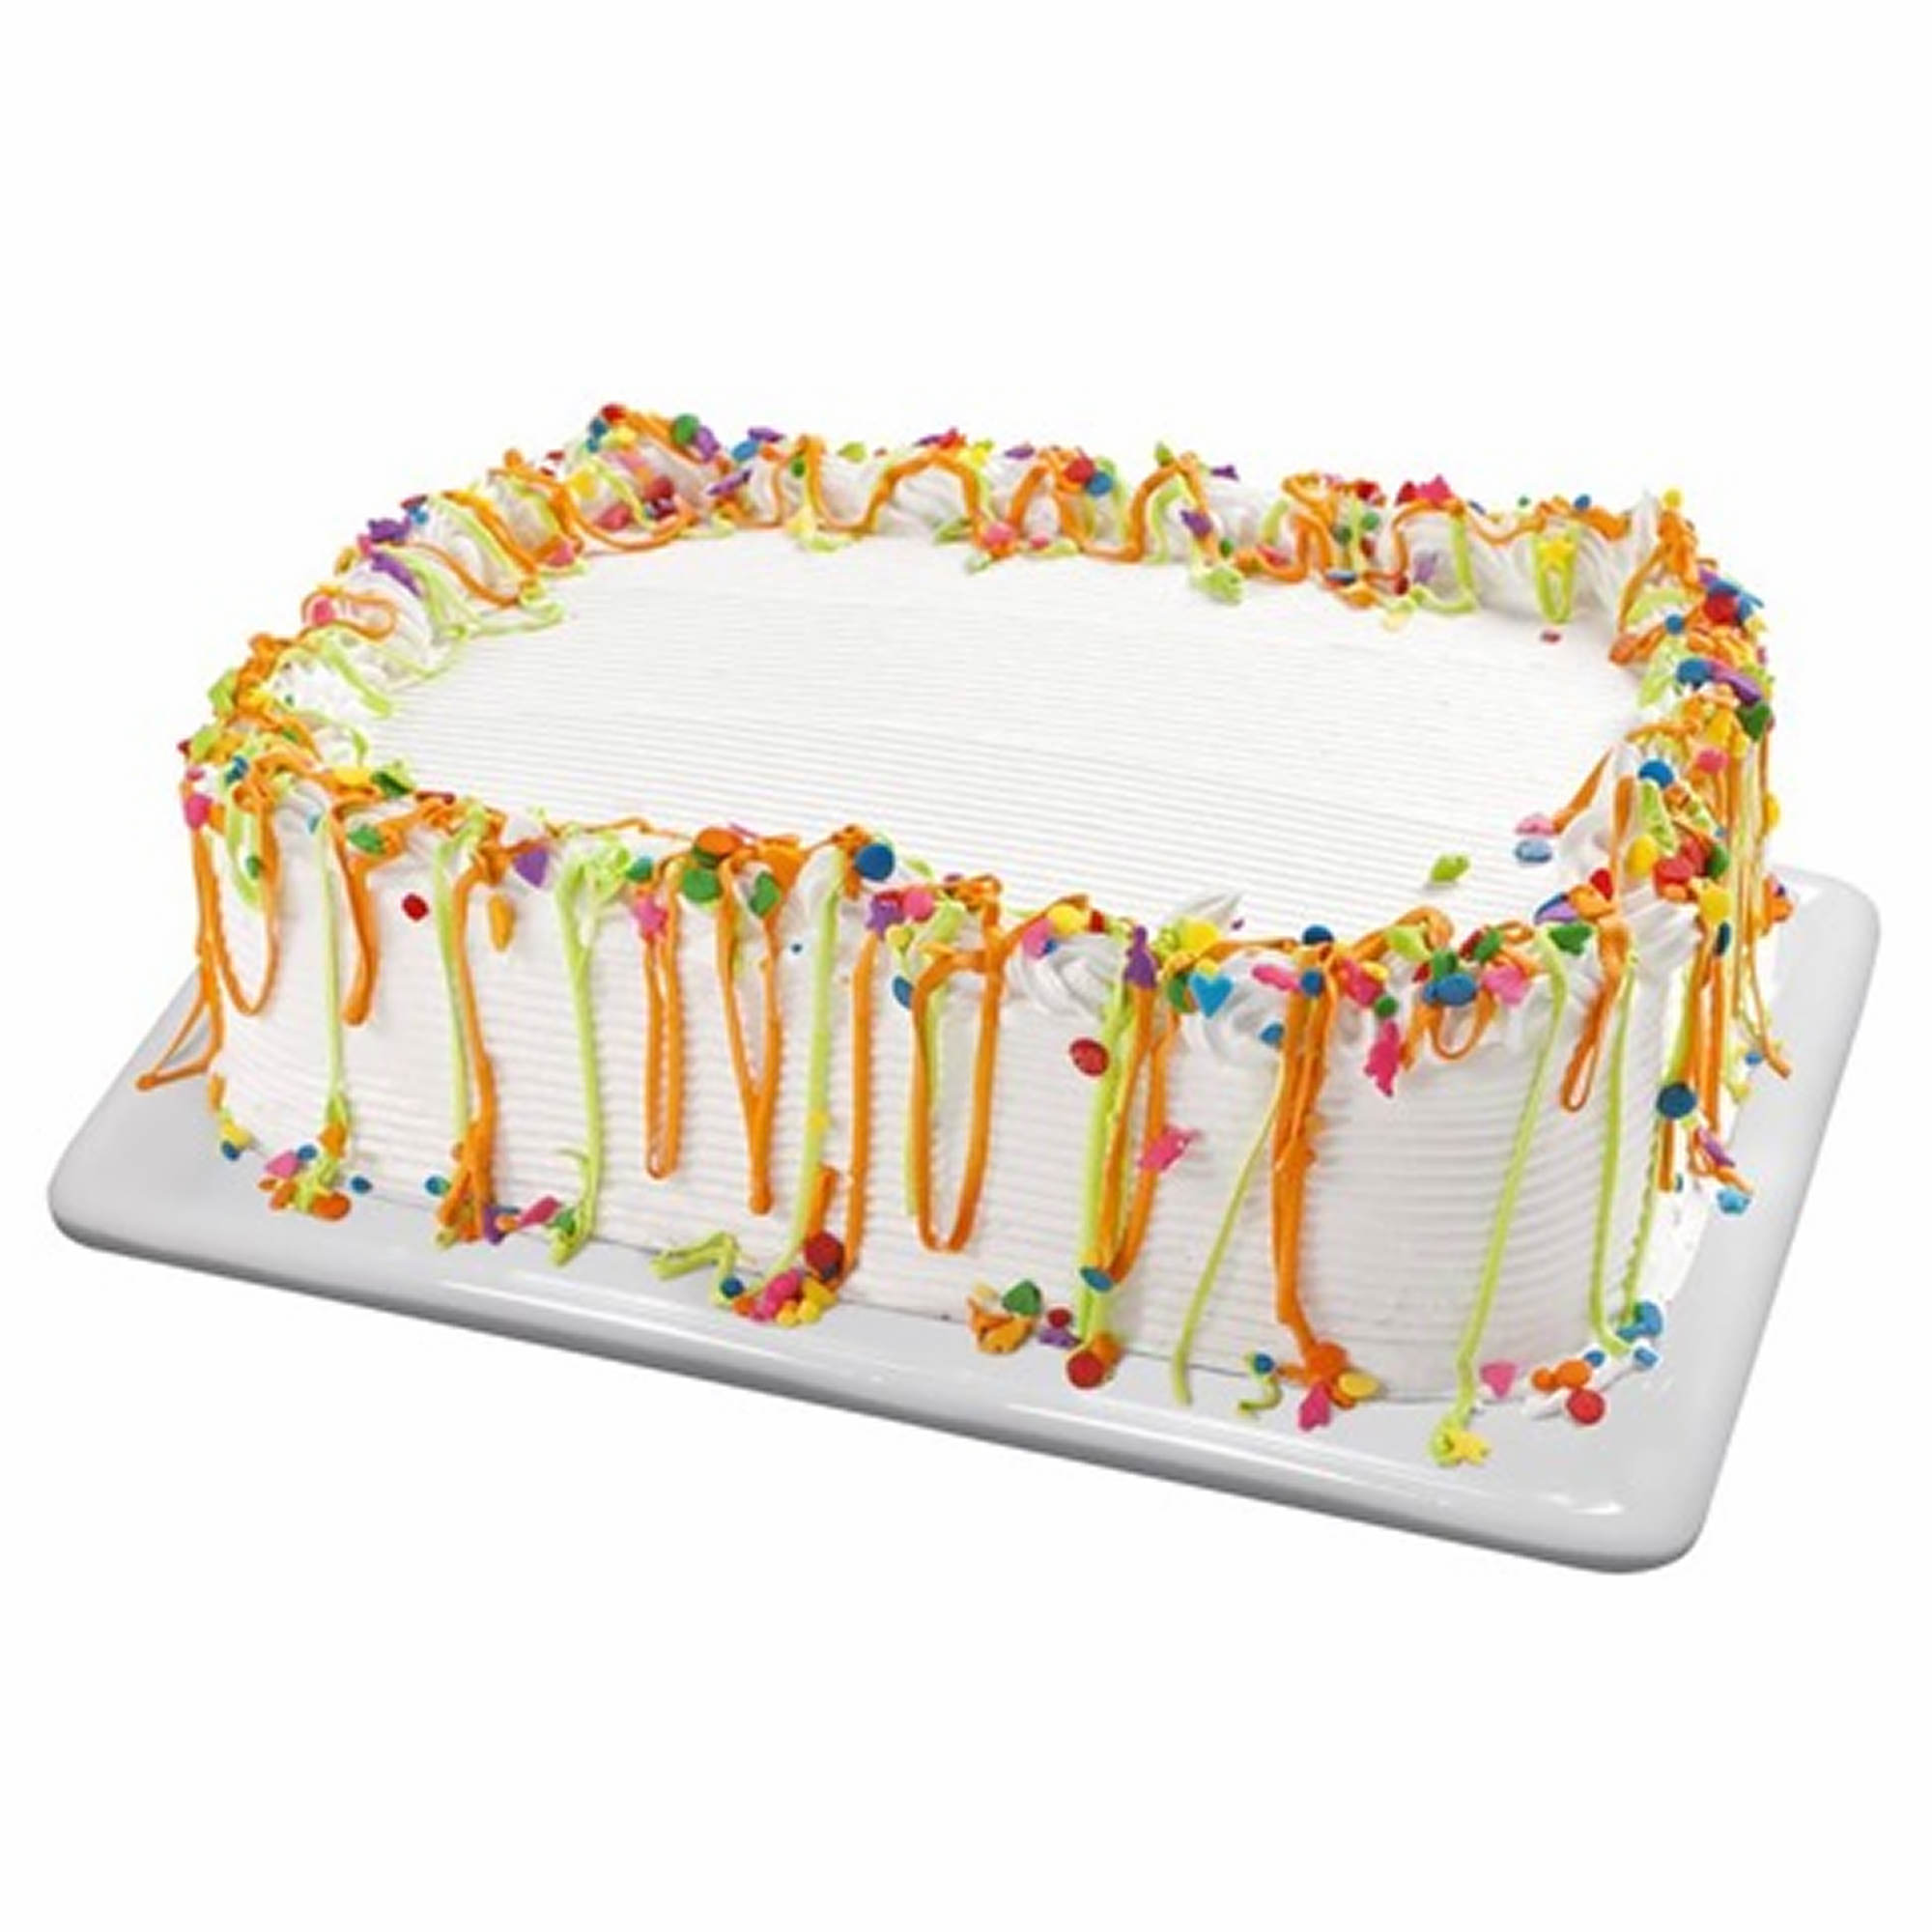 Wellsley Farms Ice Cream Cake